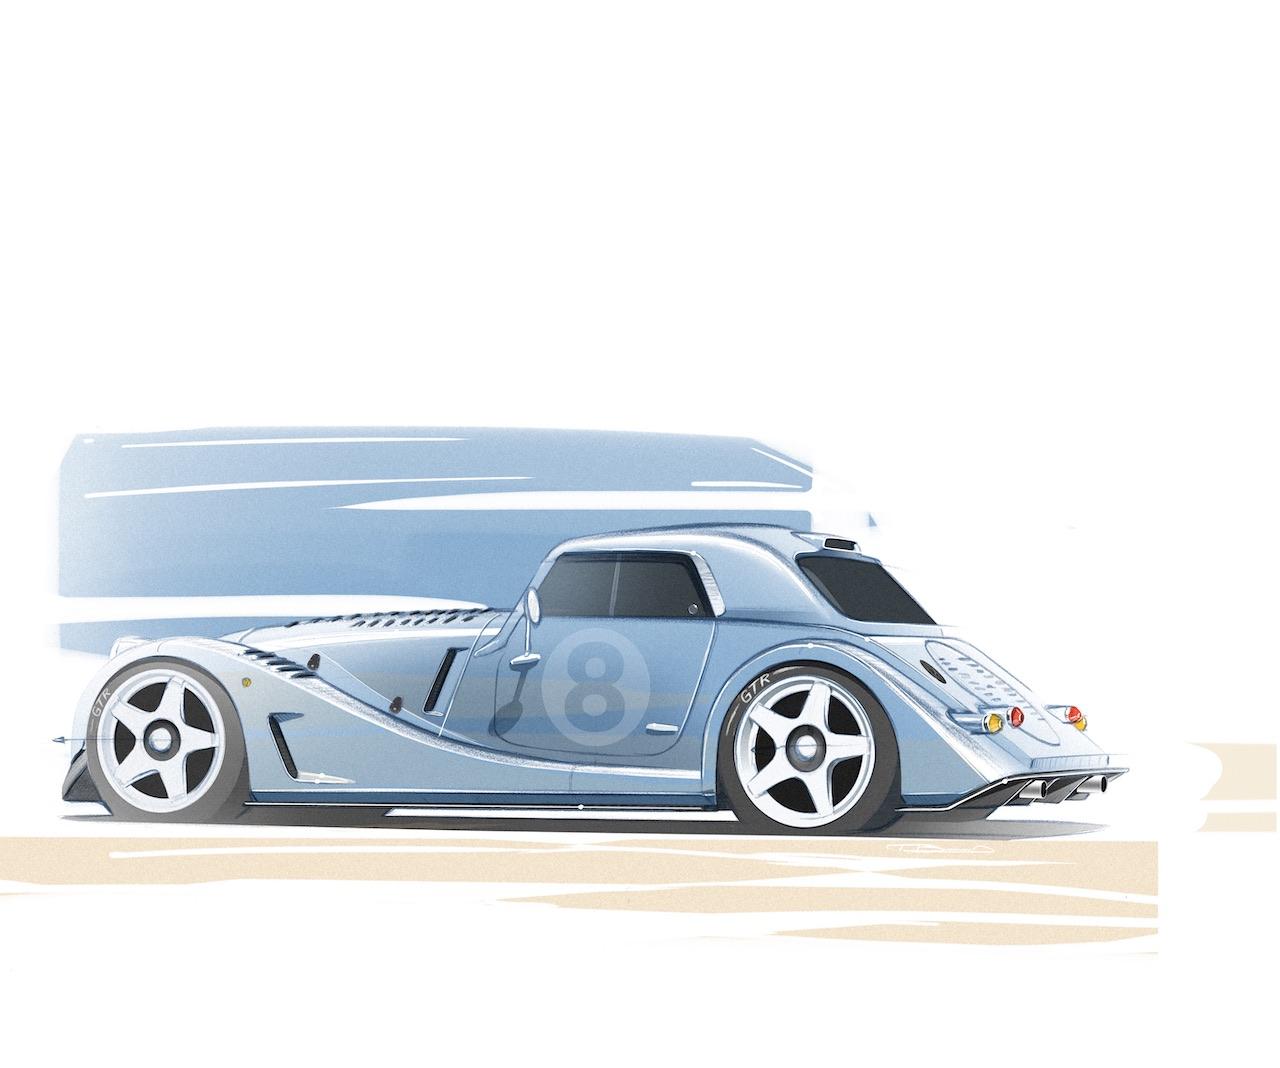 Morgan Motor Company unveils Plus 8 GTR special project